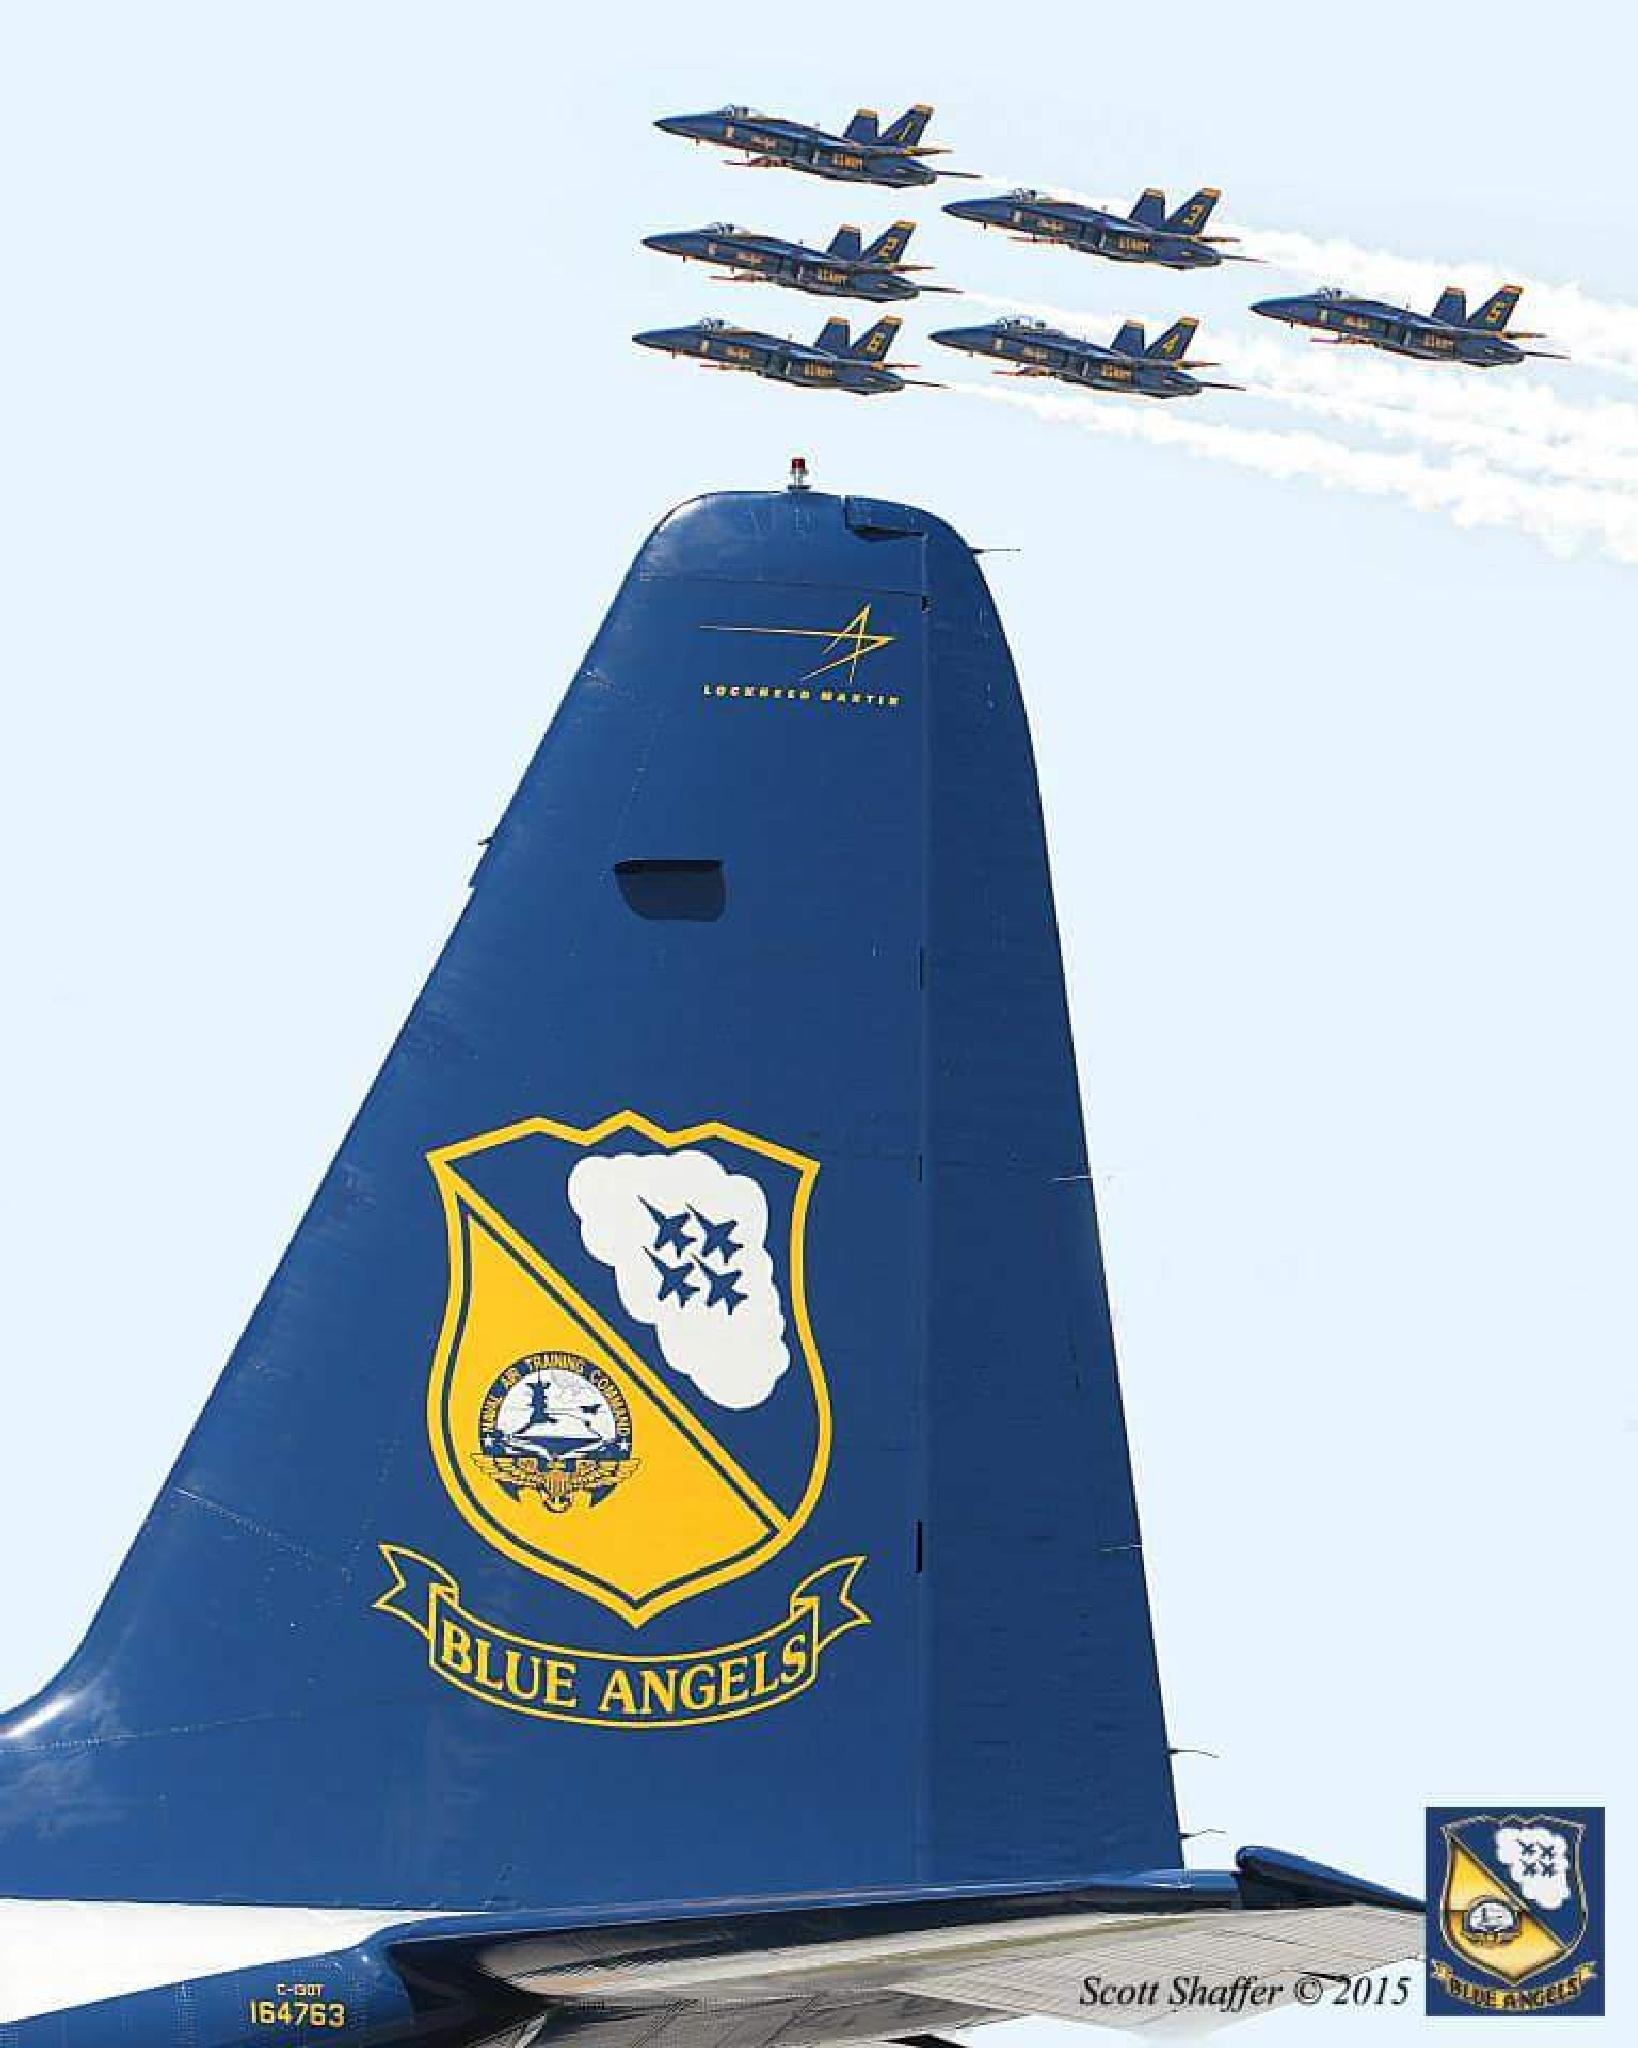 Blue Angels by Scott Shaffer